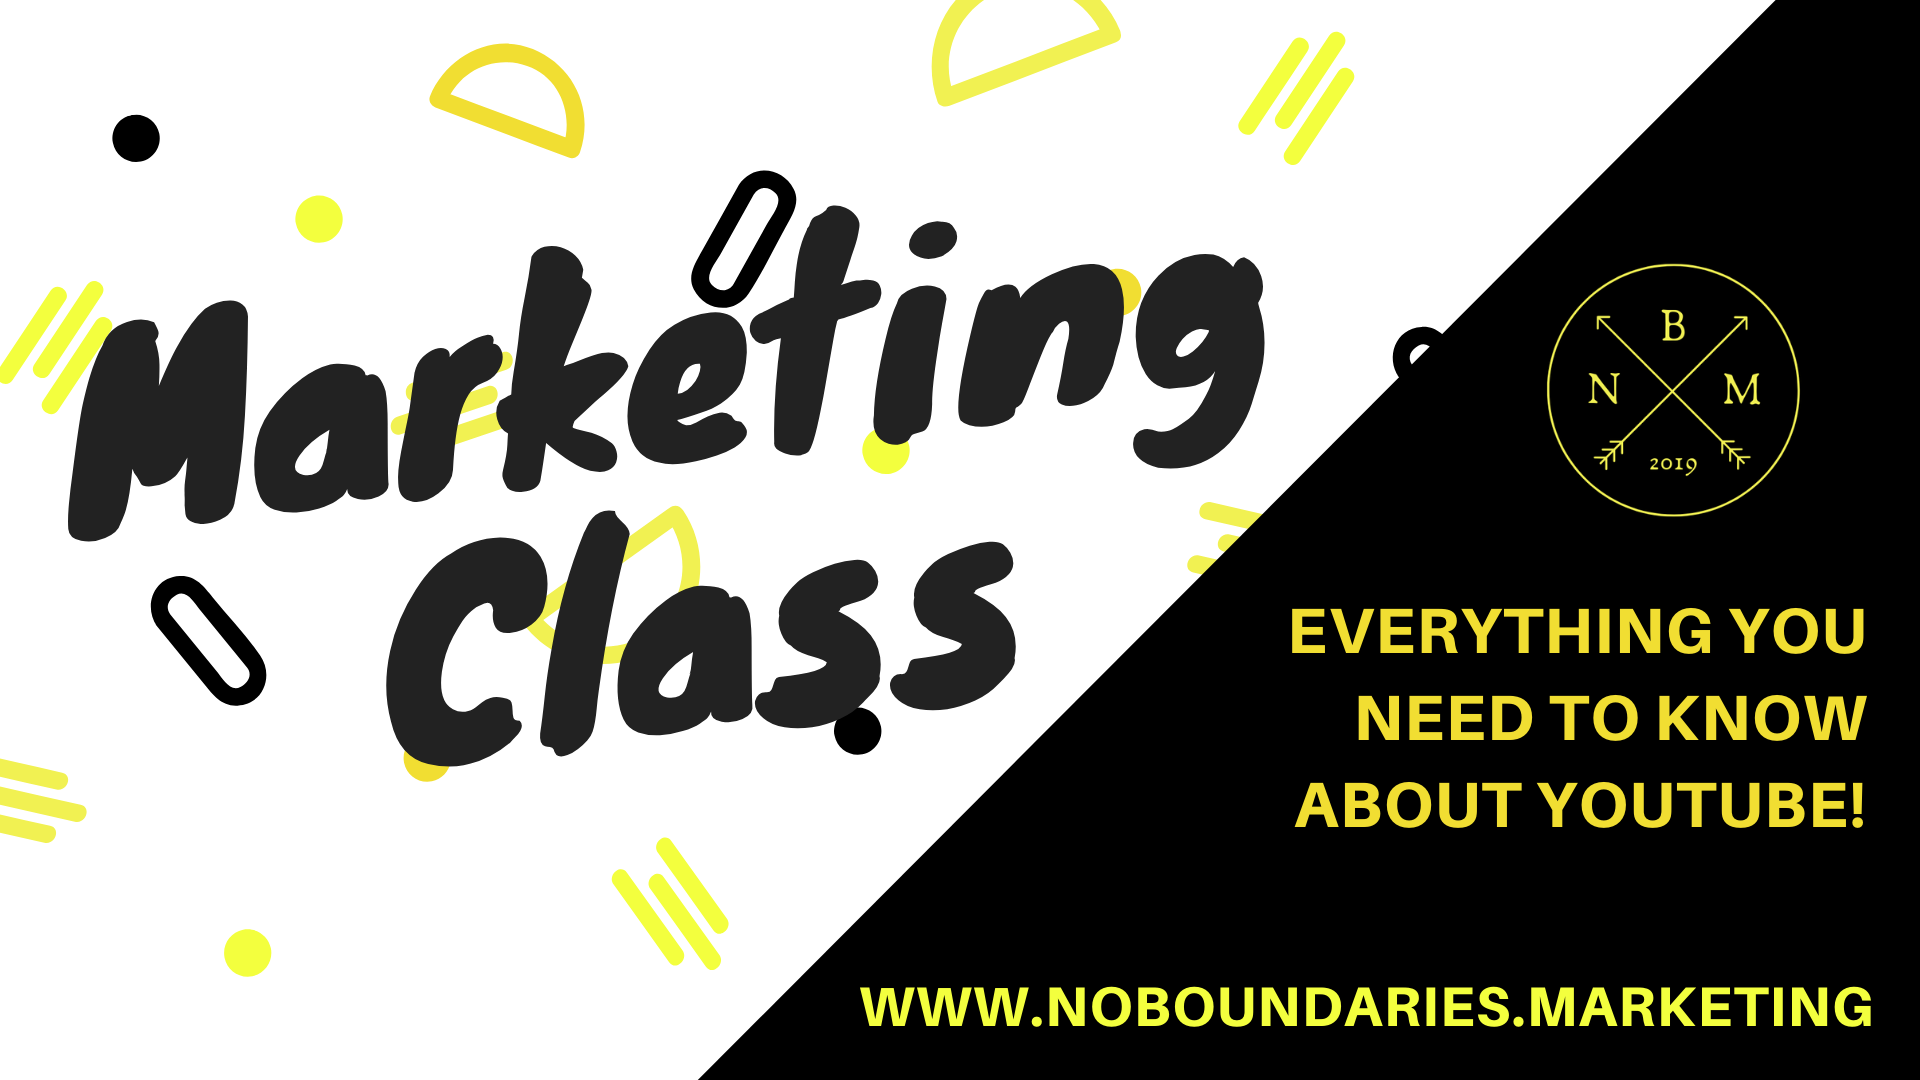 noboundaries.marketing